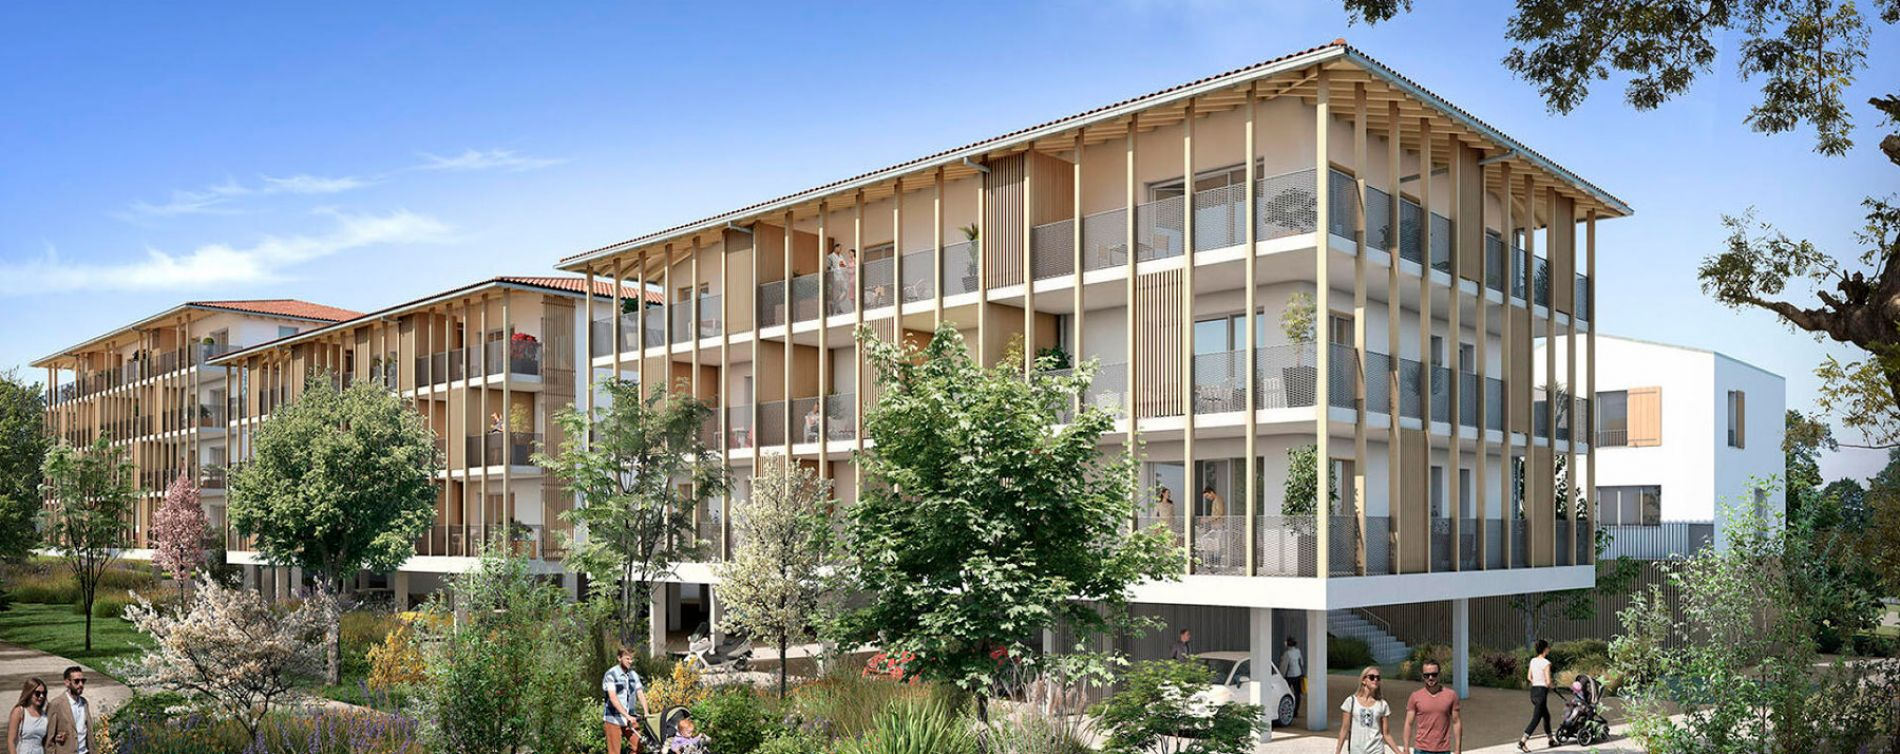 Ondres : programme immobilier neuve « Programme immobilier n°217512 » (2)